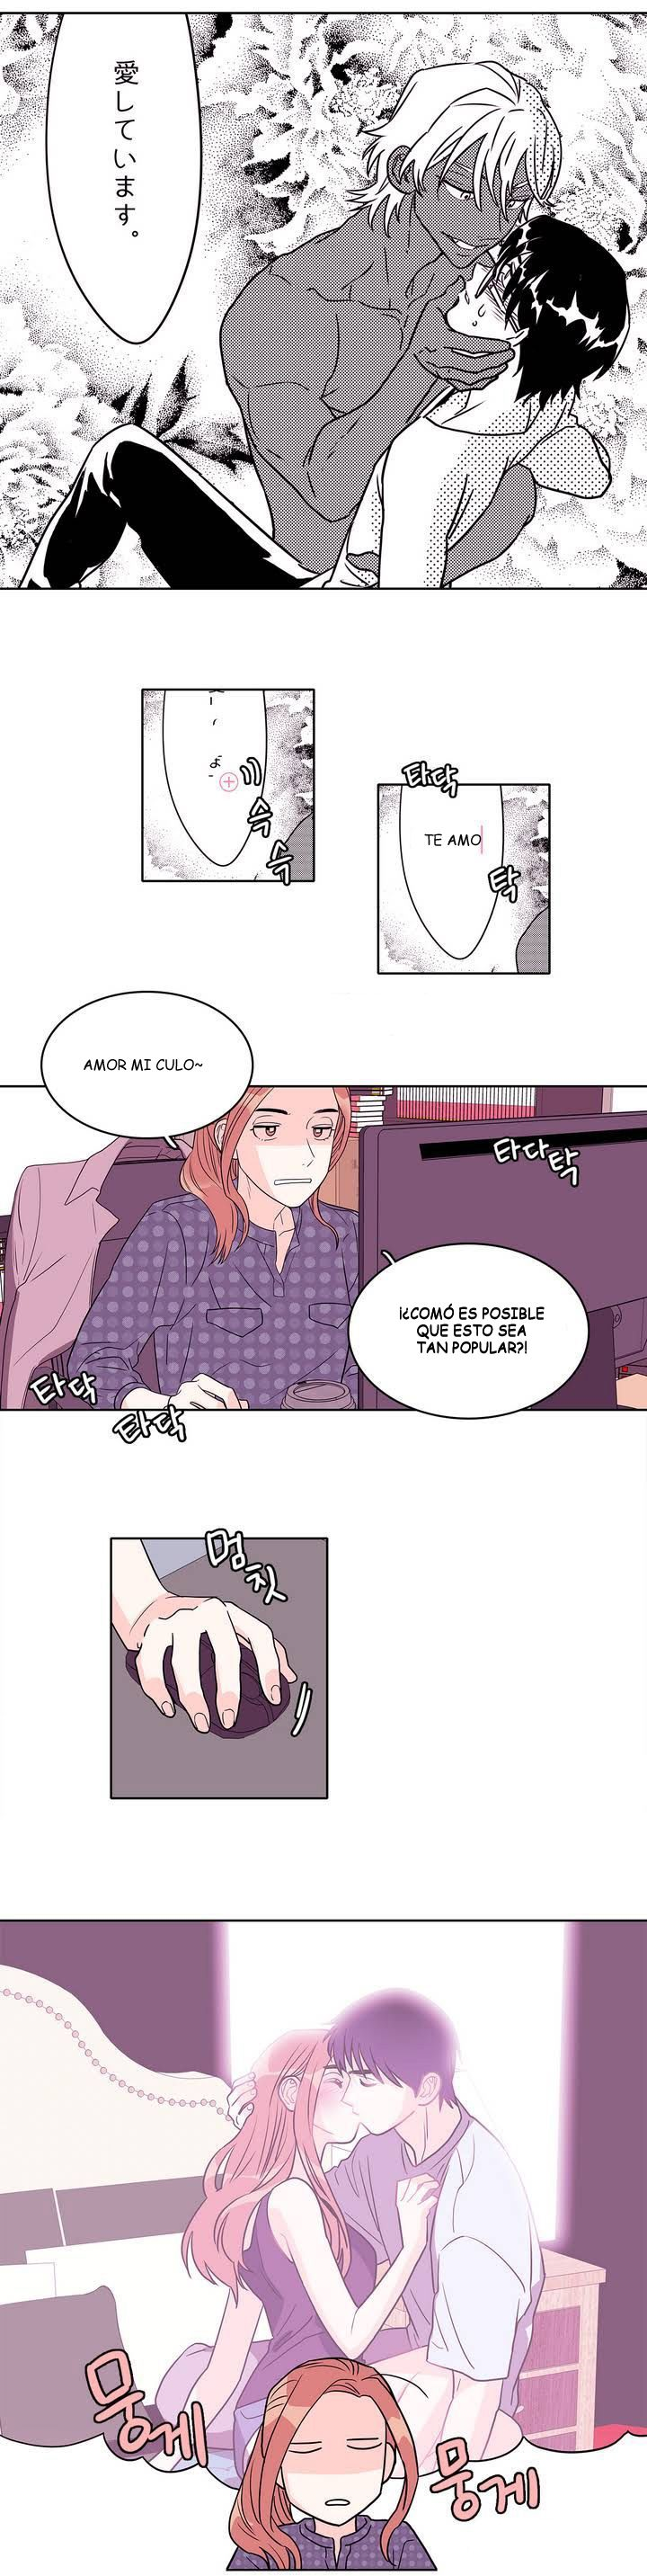 http://c5.ninemanga.com/es_manga/51/19443/461705/396bb0f13e994cc5f55bed43158f8b7d.jpg Page 2